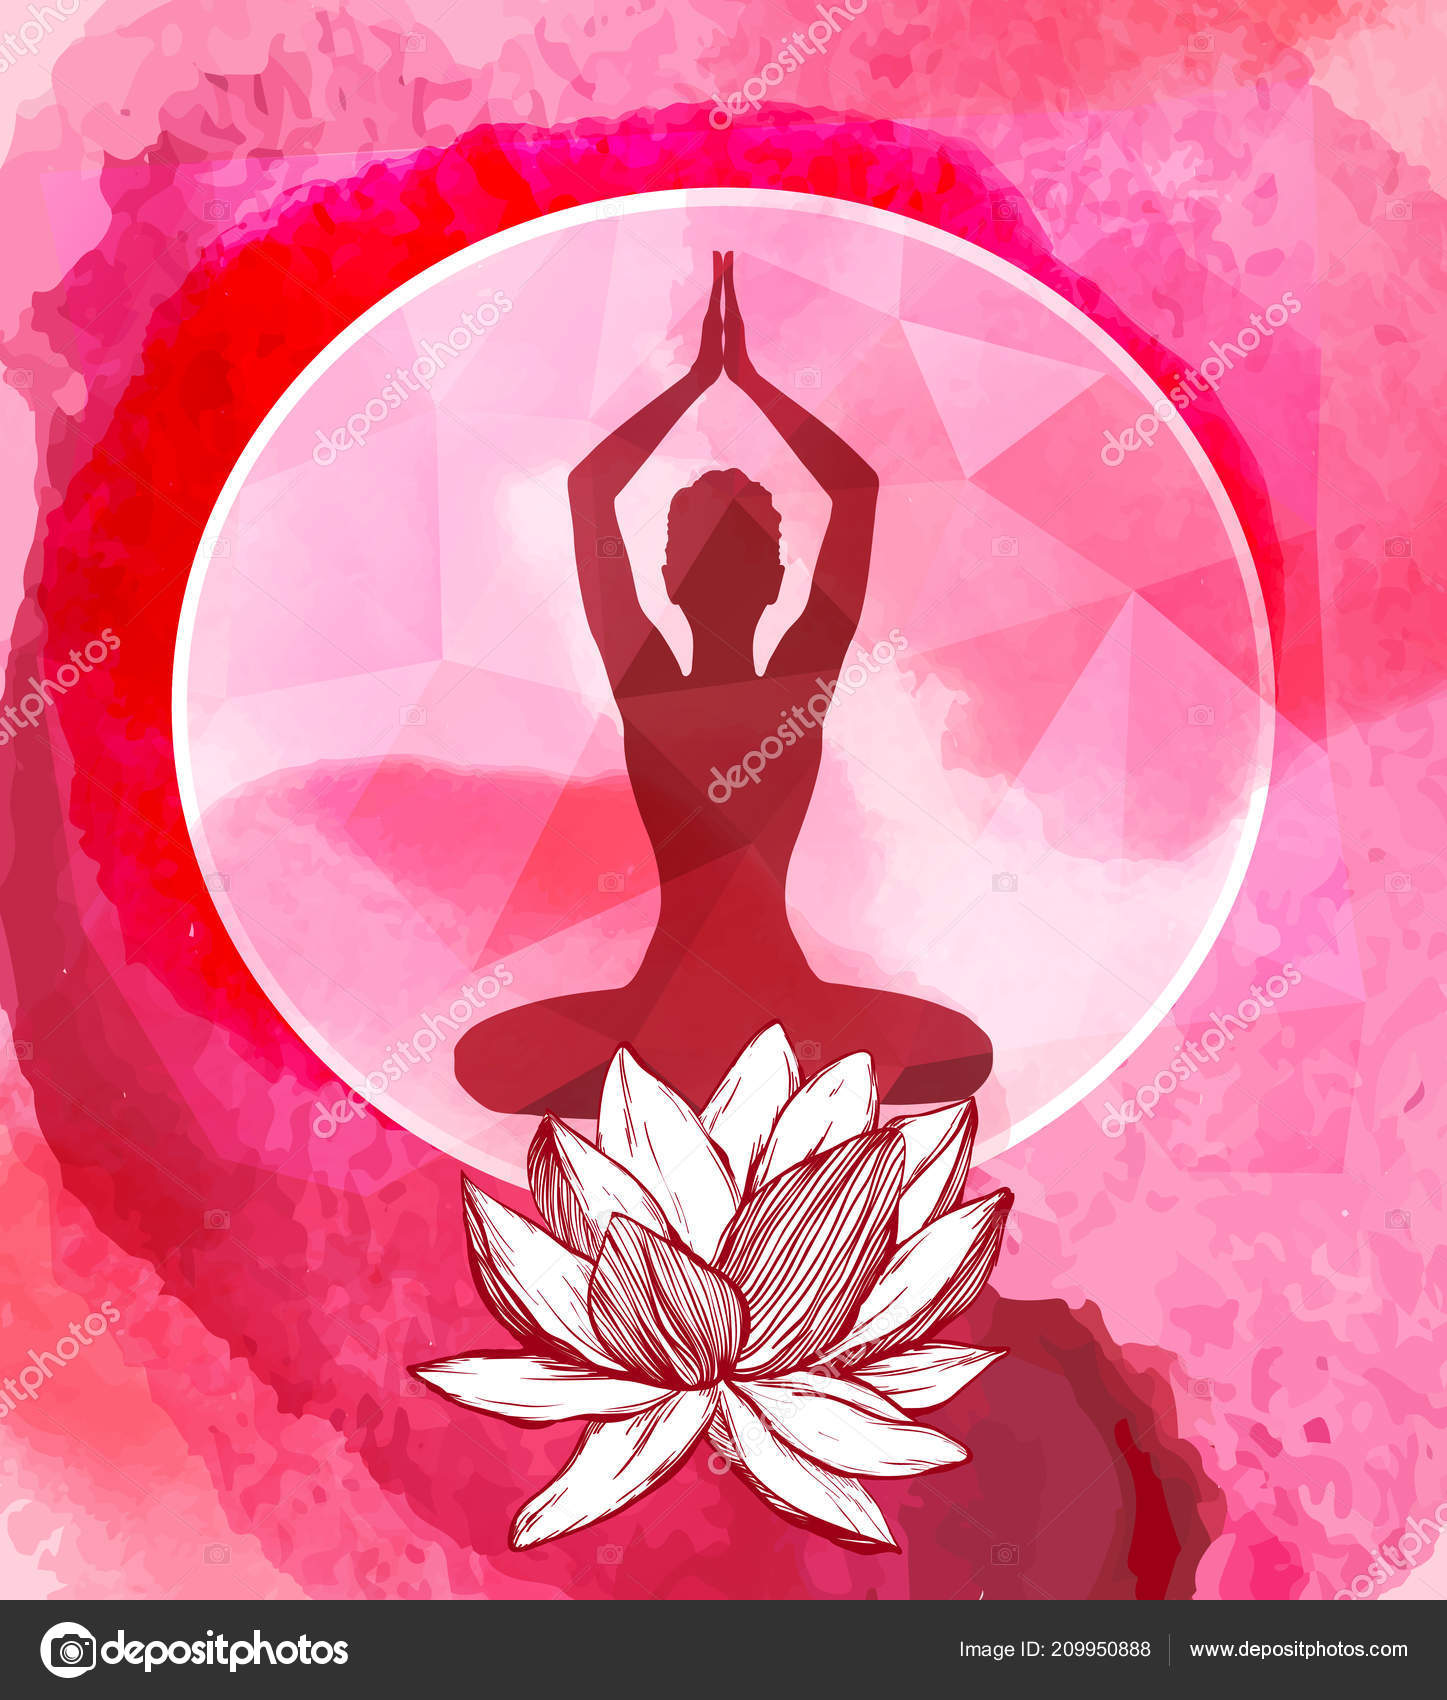 Fiori Yoga.Lotus Flower And Female Silhouette Above It Yoga Logo Emblem